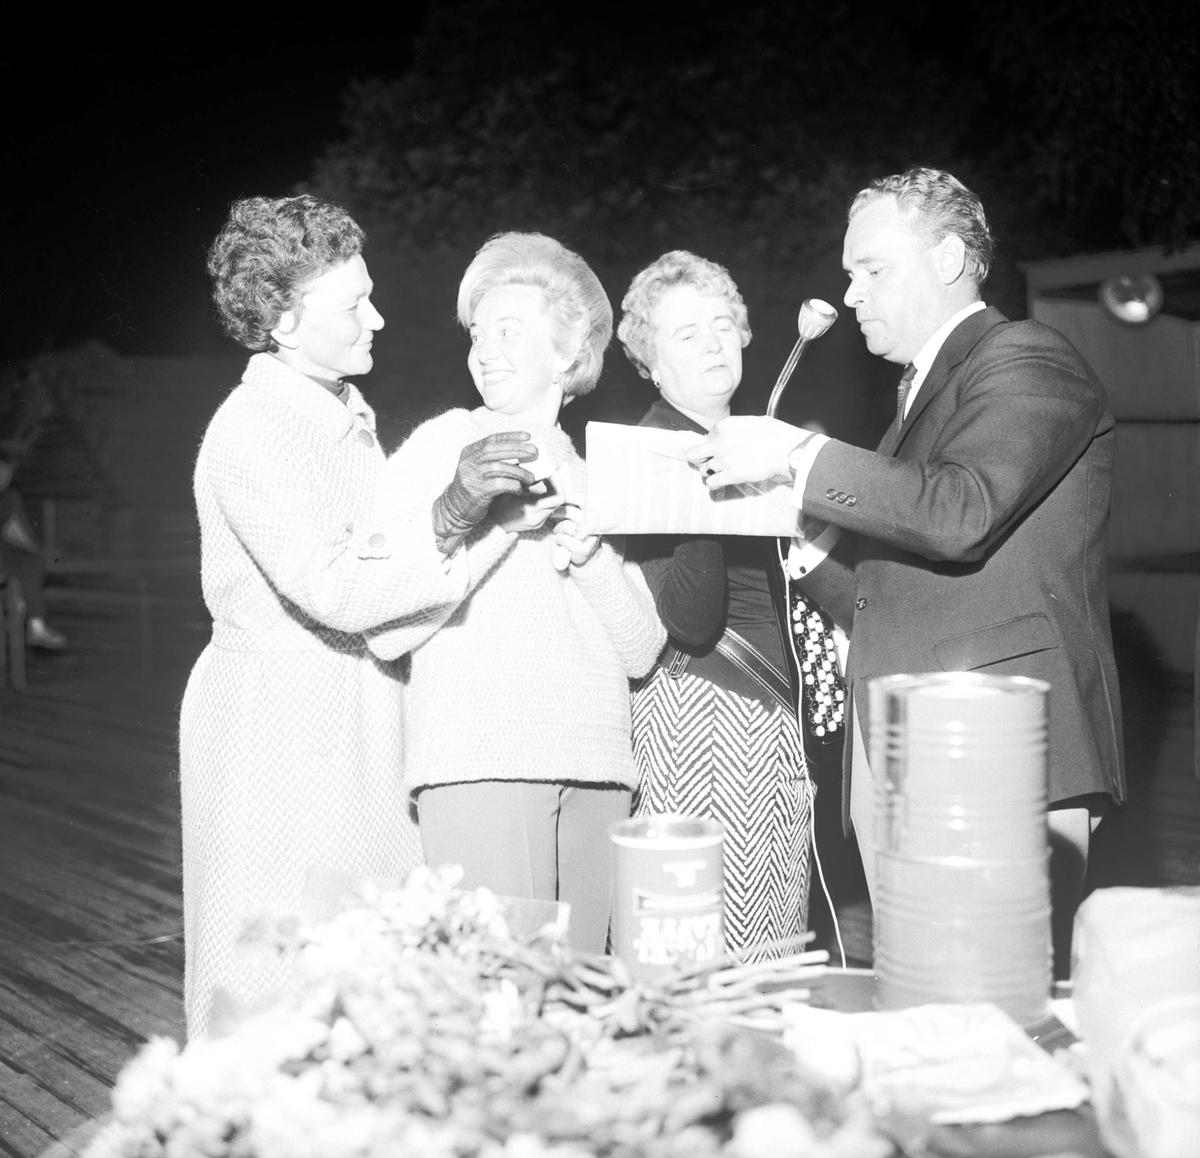 Augustikvitter i Tierp, Uppland augusti 1966